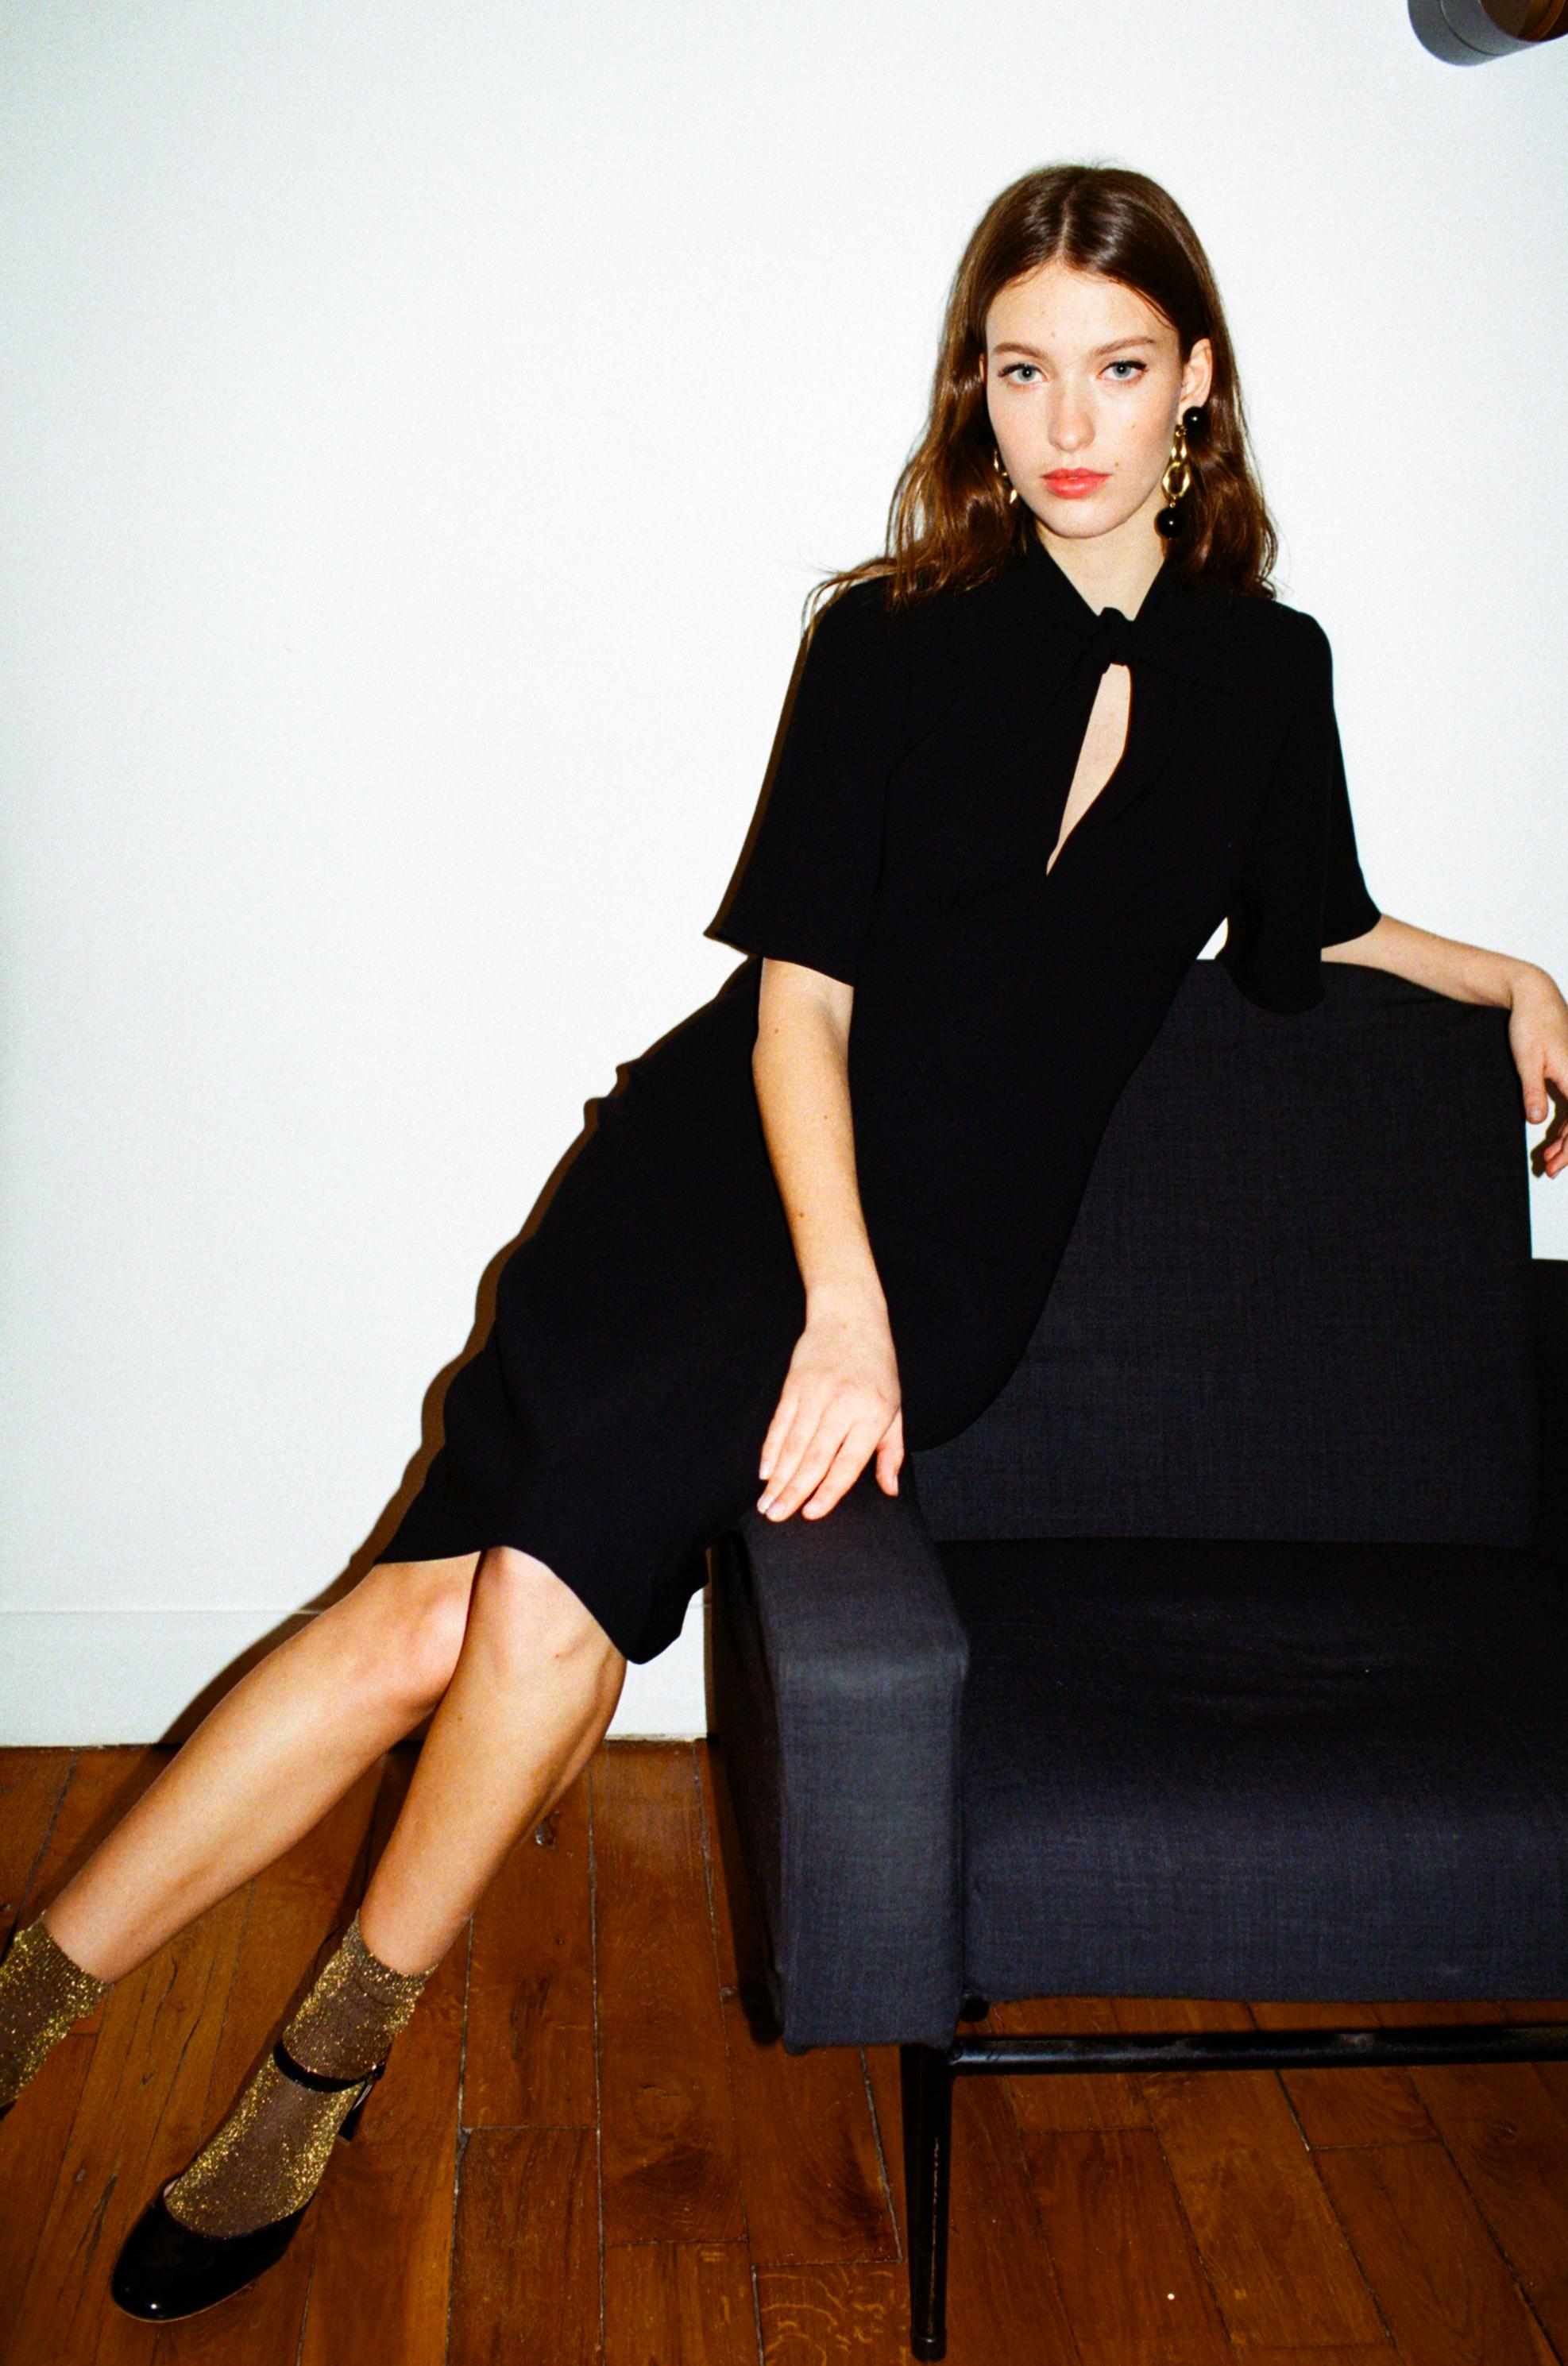 Nathalie Dumeix 39